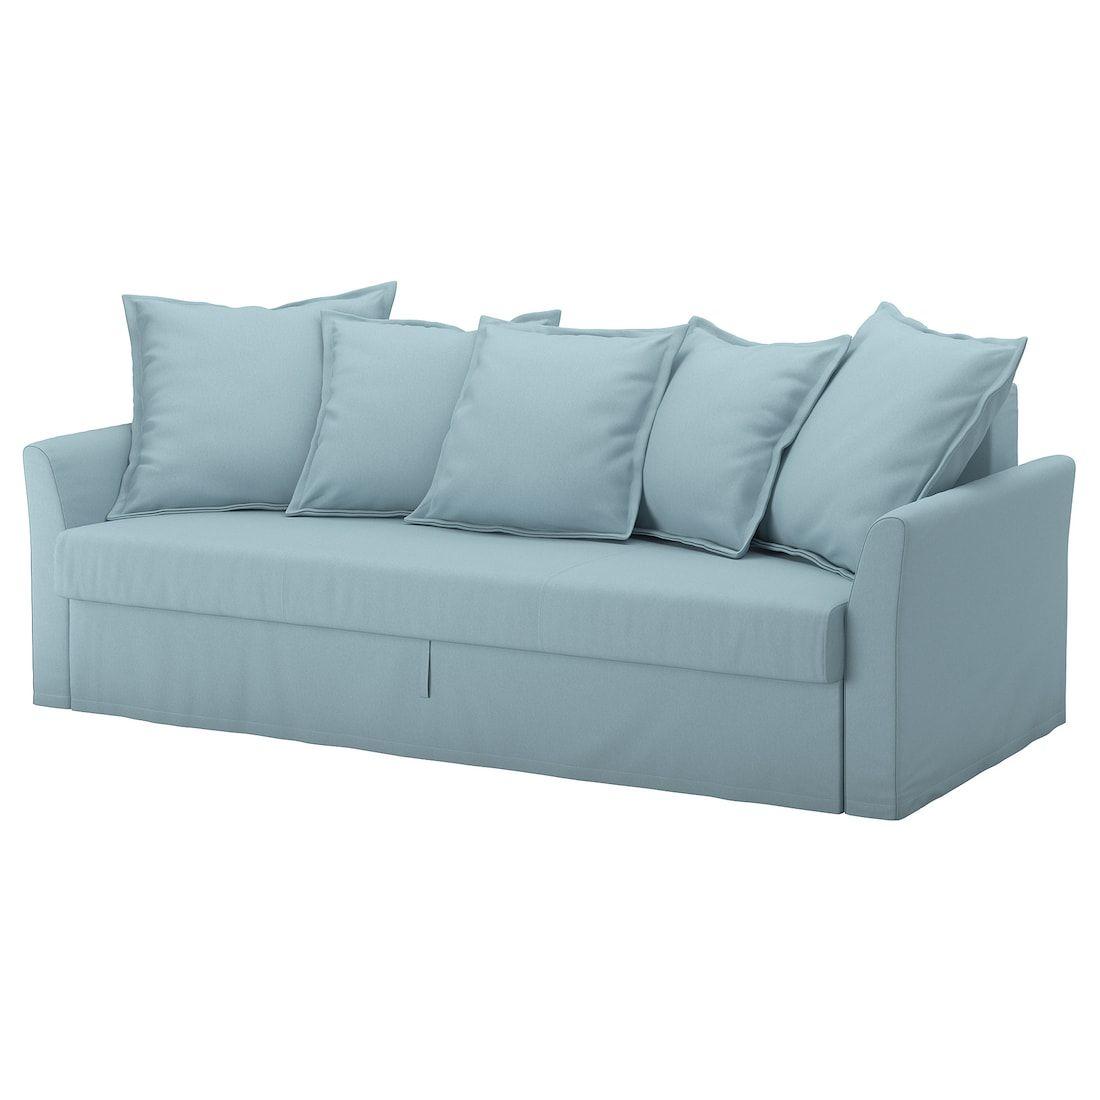 Holmsund Sleeper Sofa Orrsta Light Blue In 2020 Sleeper Sofa Corner Sofa Bed Sofa